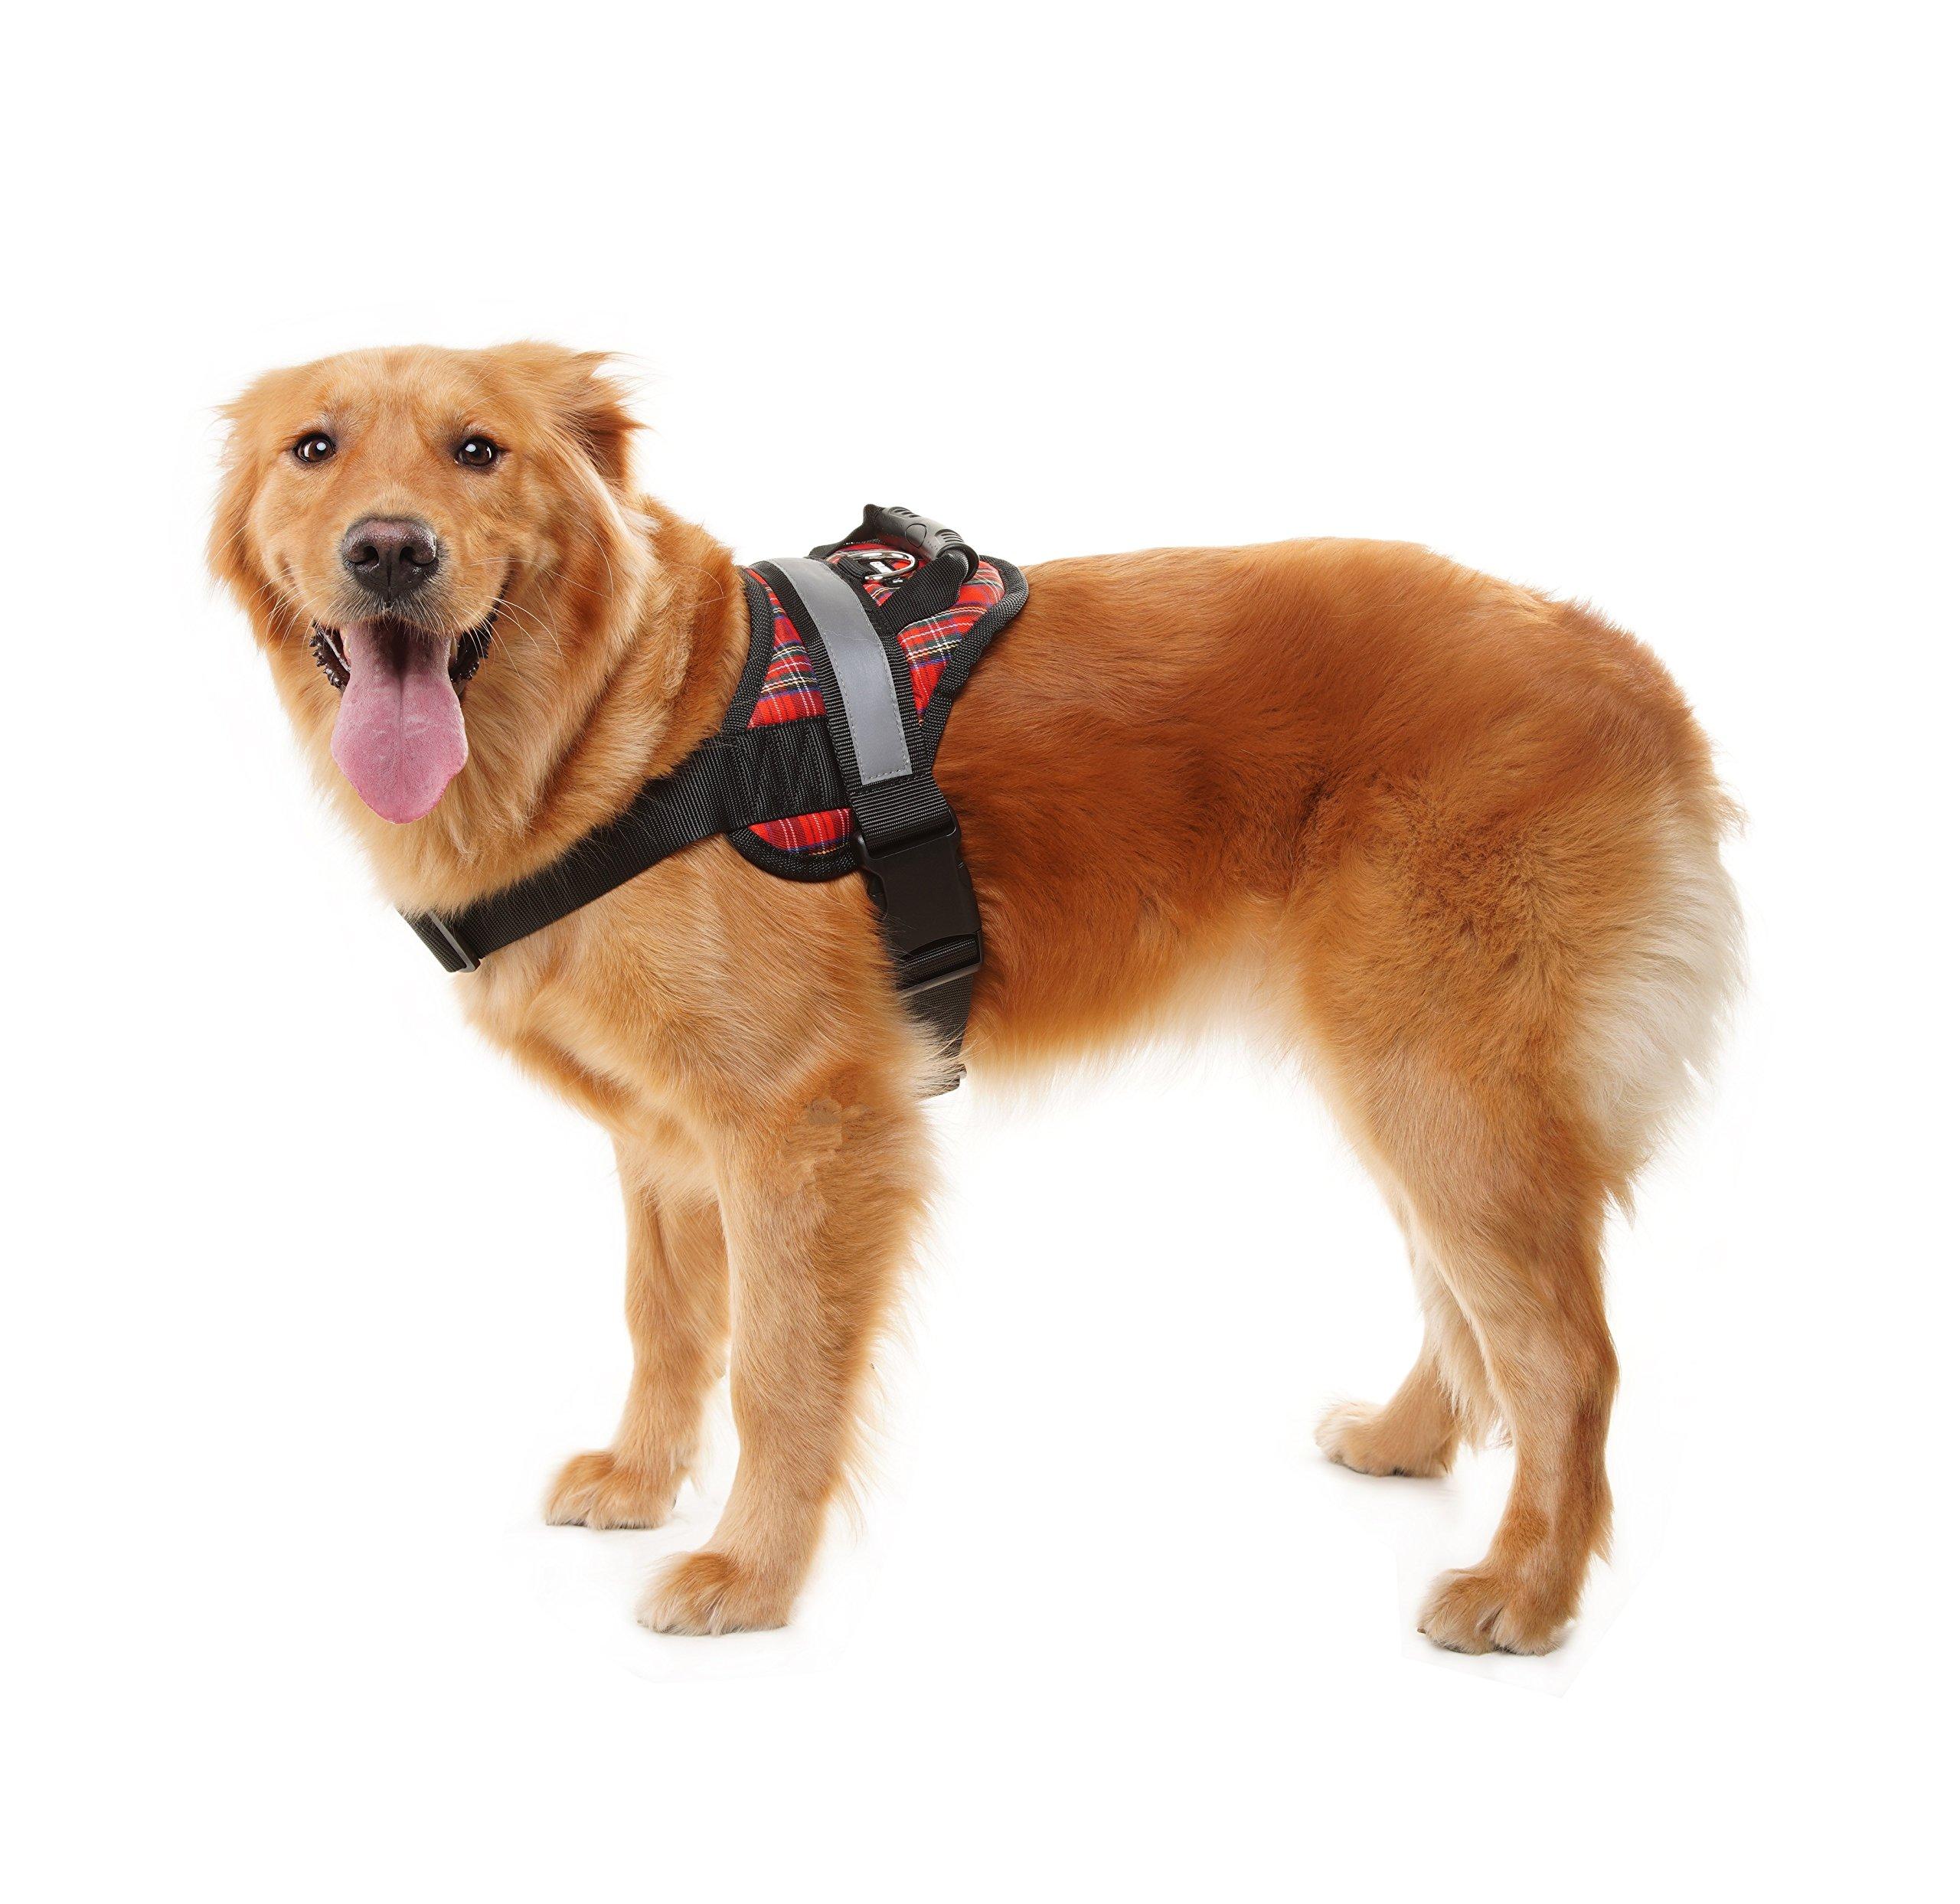 EXPAWLORER Big Dog Soft Reflective No Pull Plaid Harness Size M 20-26inch by EXPAWLORER (Image #1)